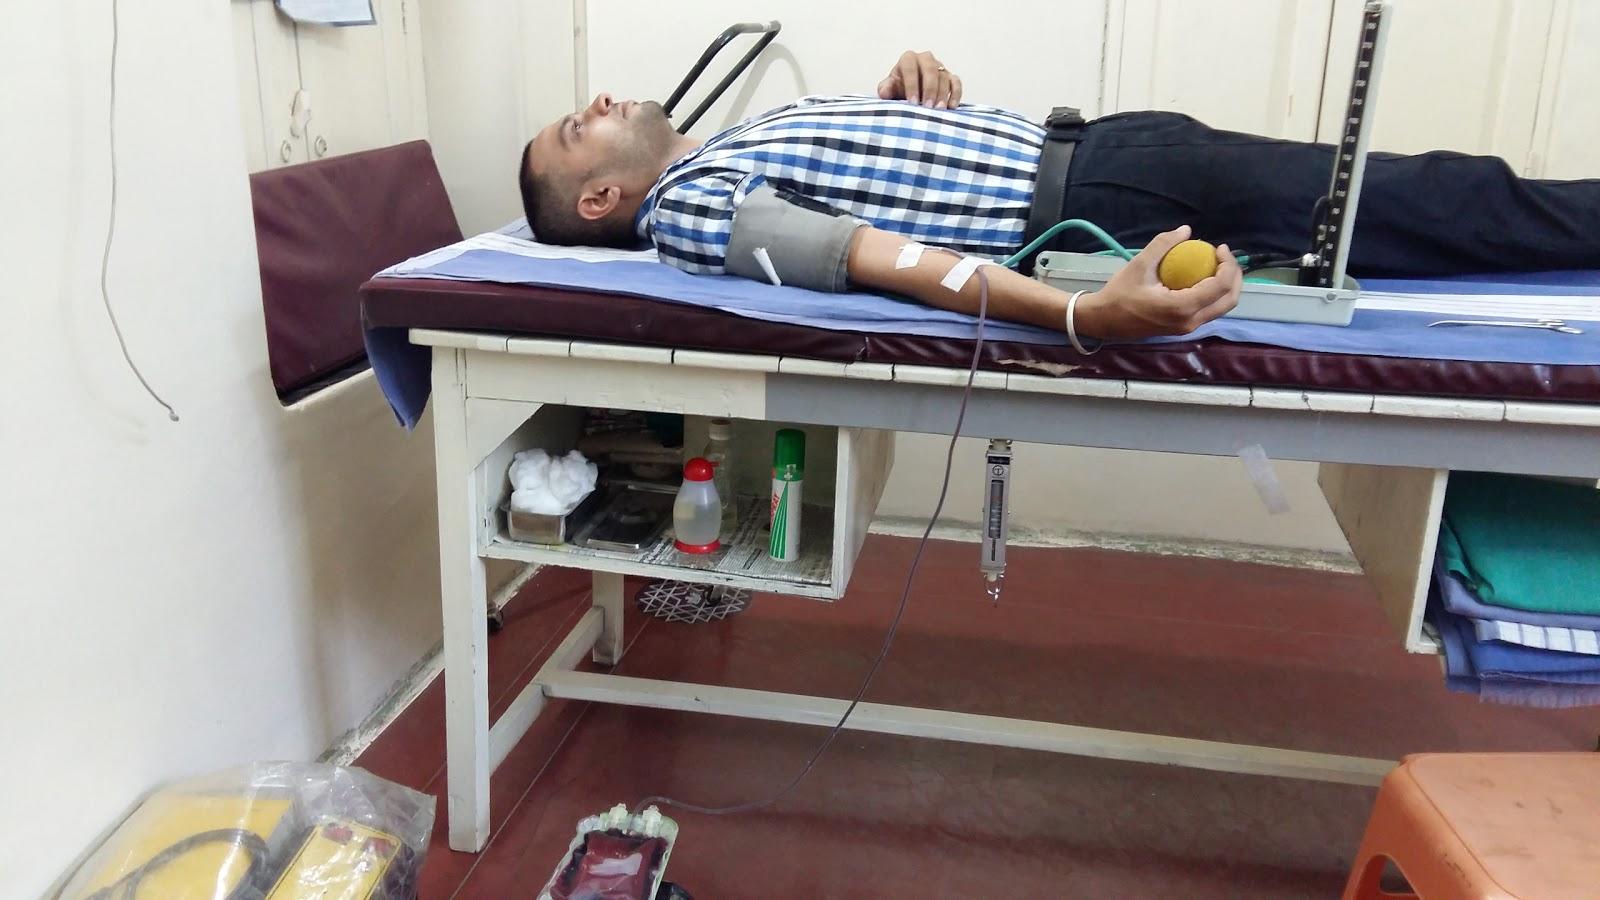 blood bank The Coimbatore Biomedical Services Blood Bank near Coimbatore Tamil Nadu